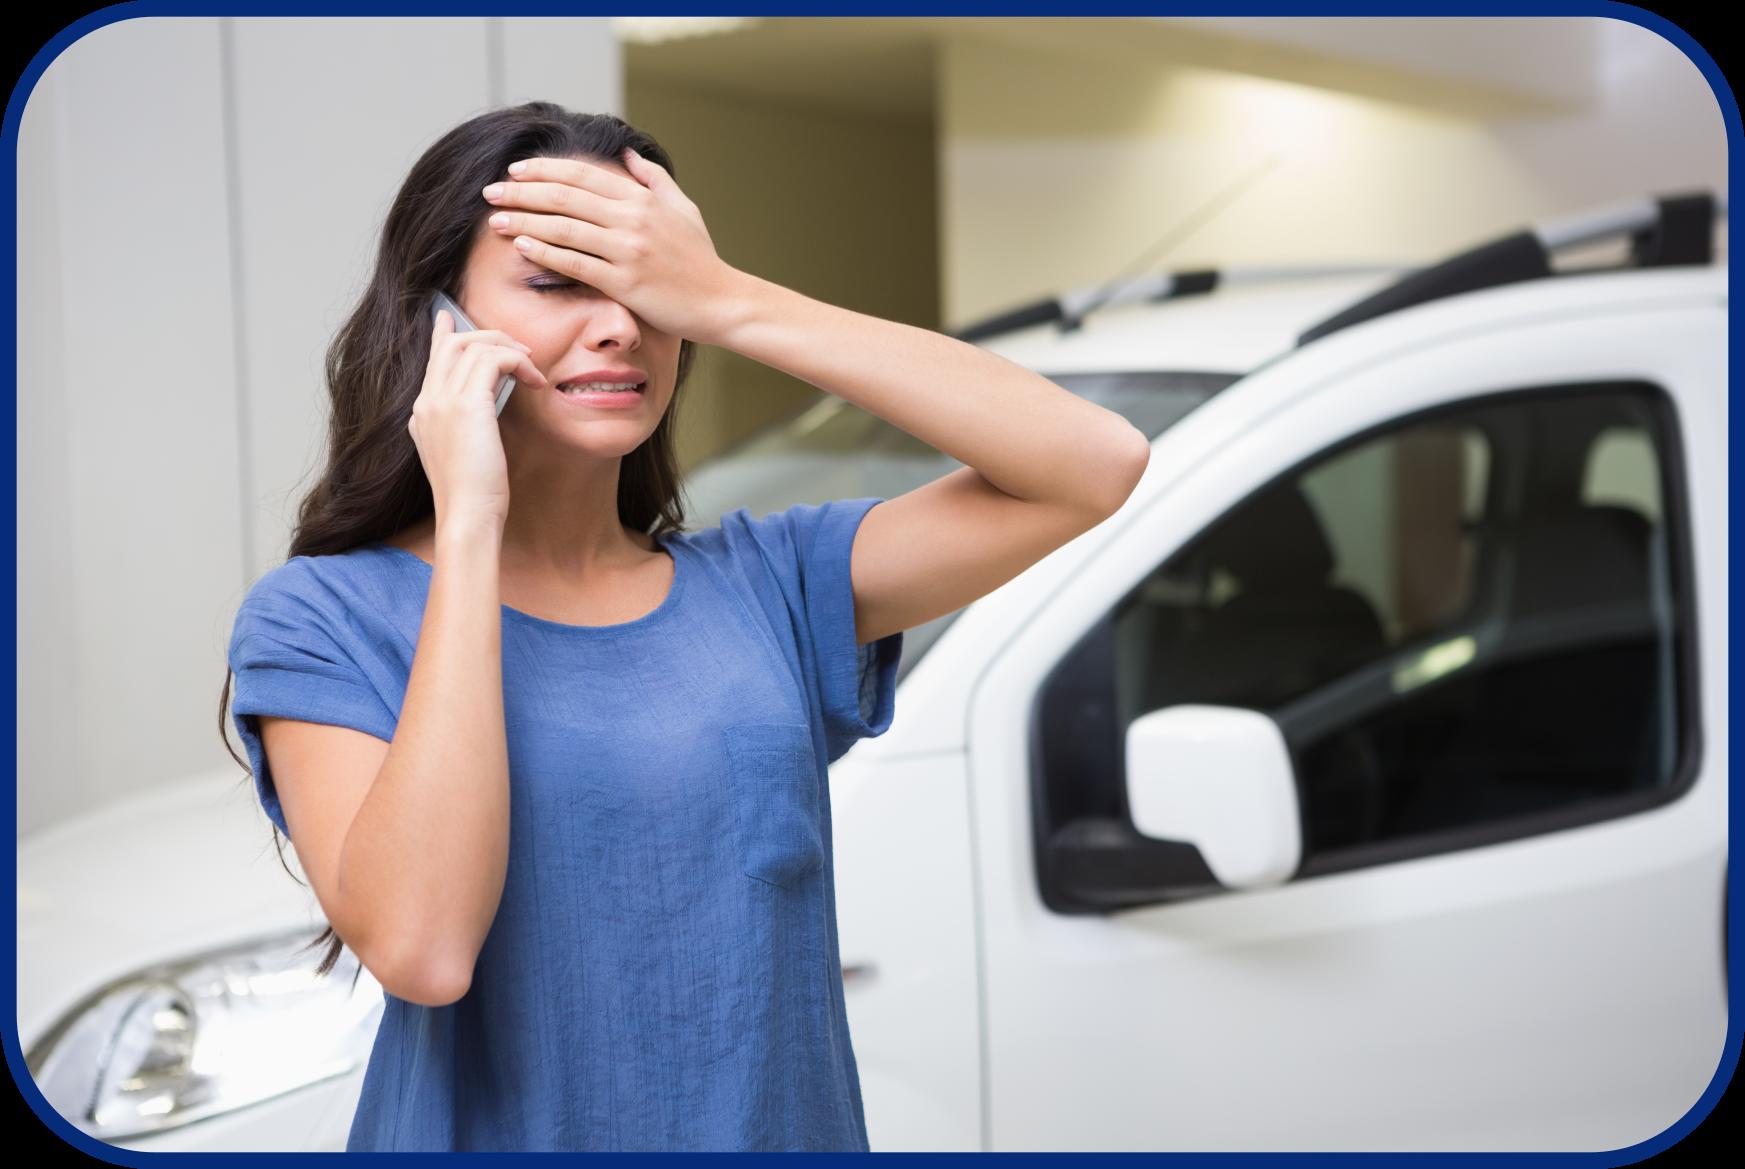 Upset Woman at Car Dealership